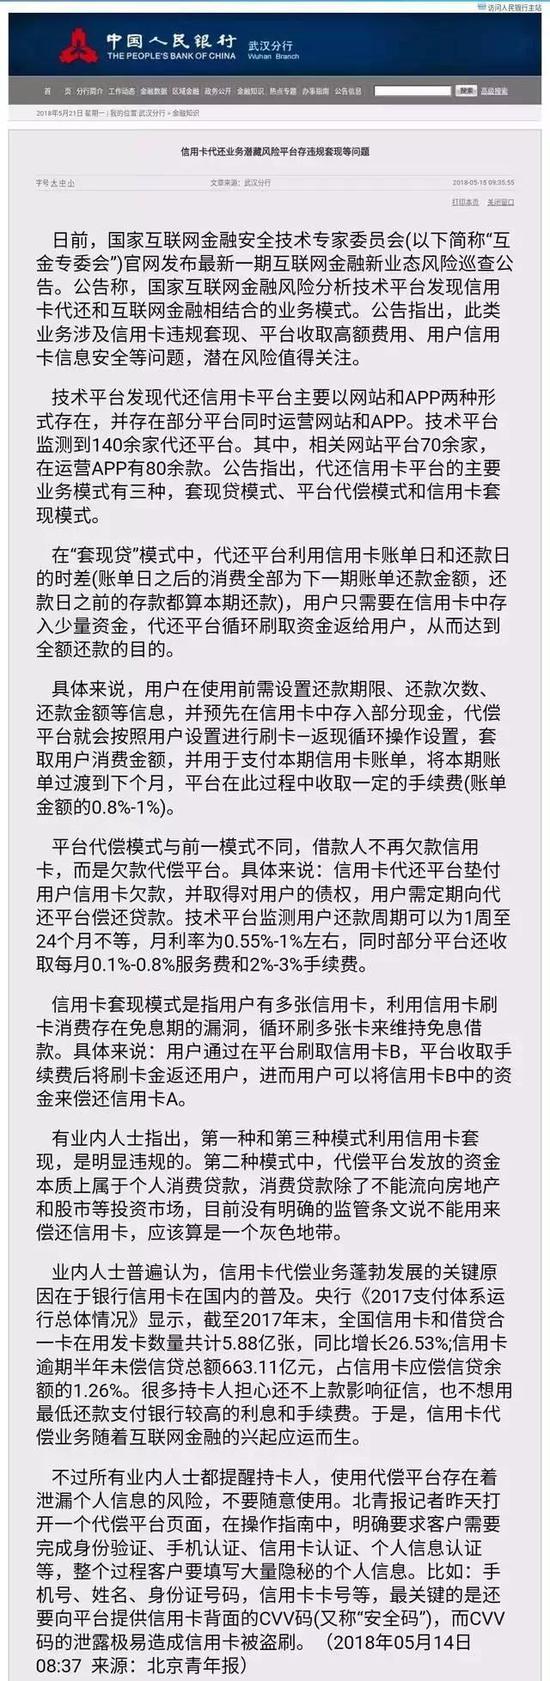 e世博是哪的 - 日媒曝本田圭佑考虑加盟中超,球迷:但没有中超球队考虑要你!